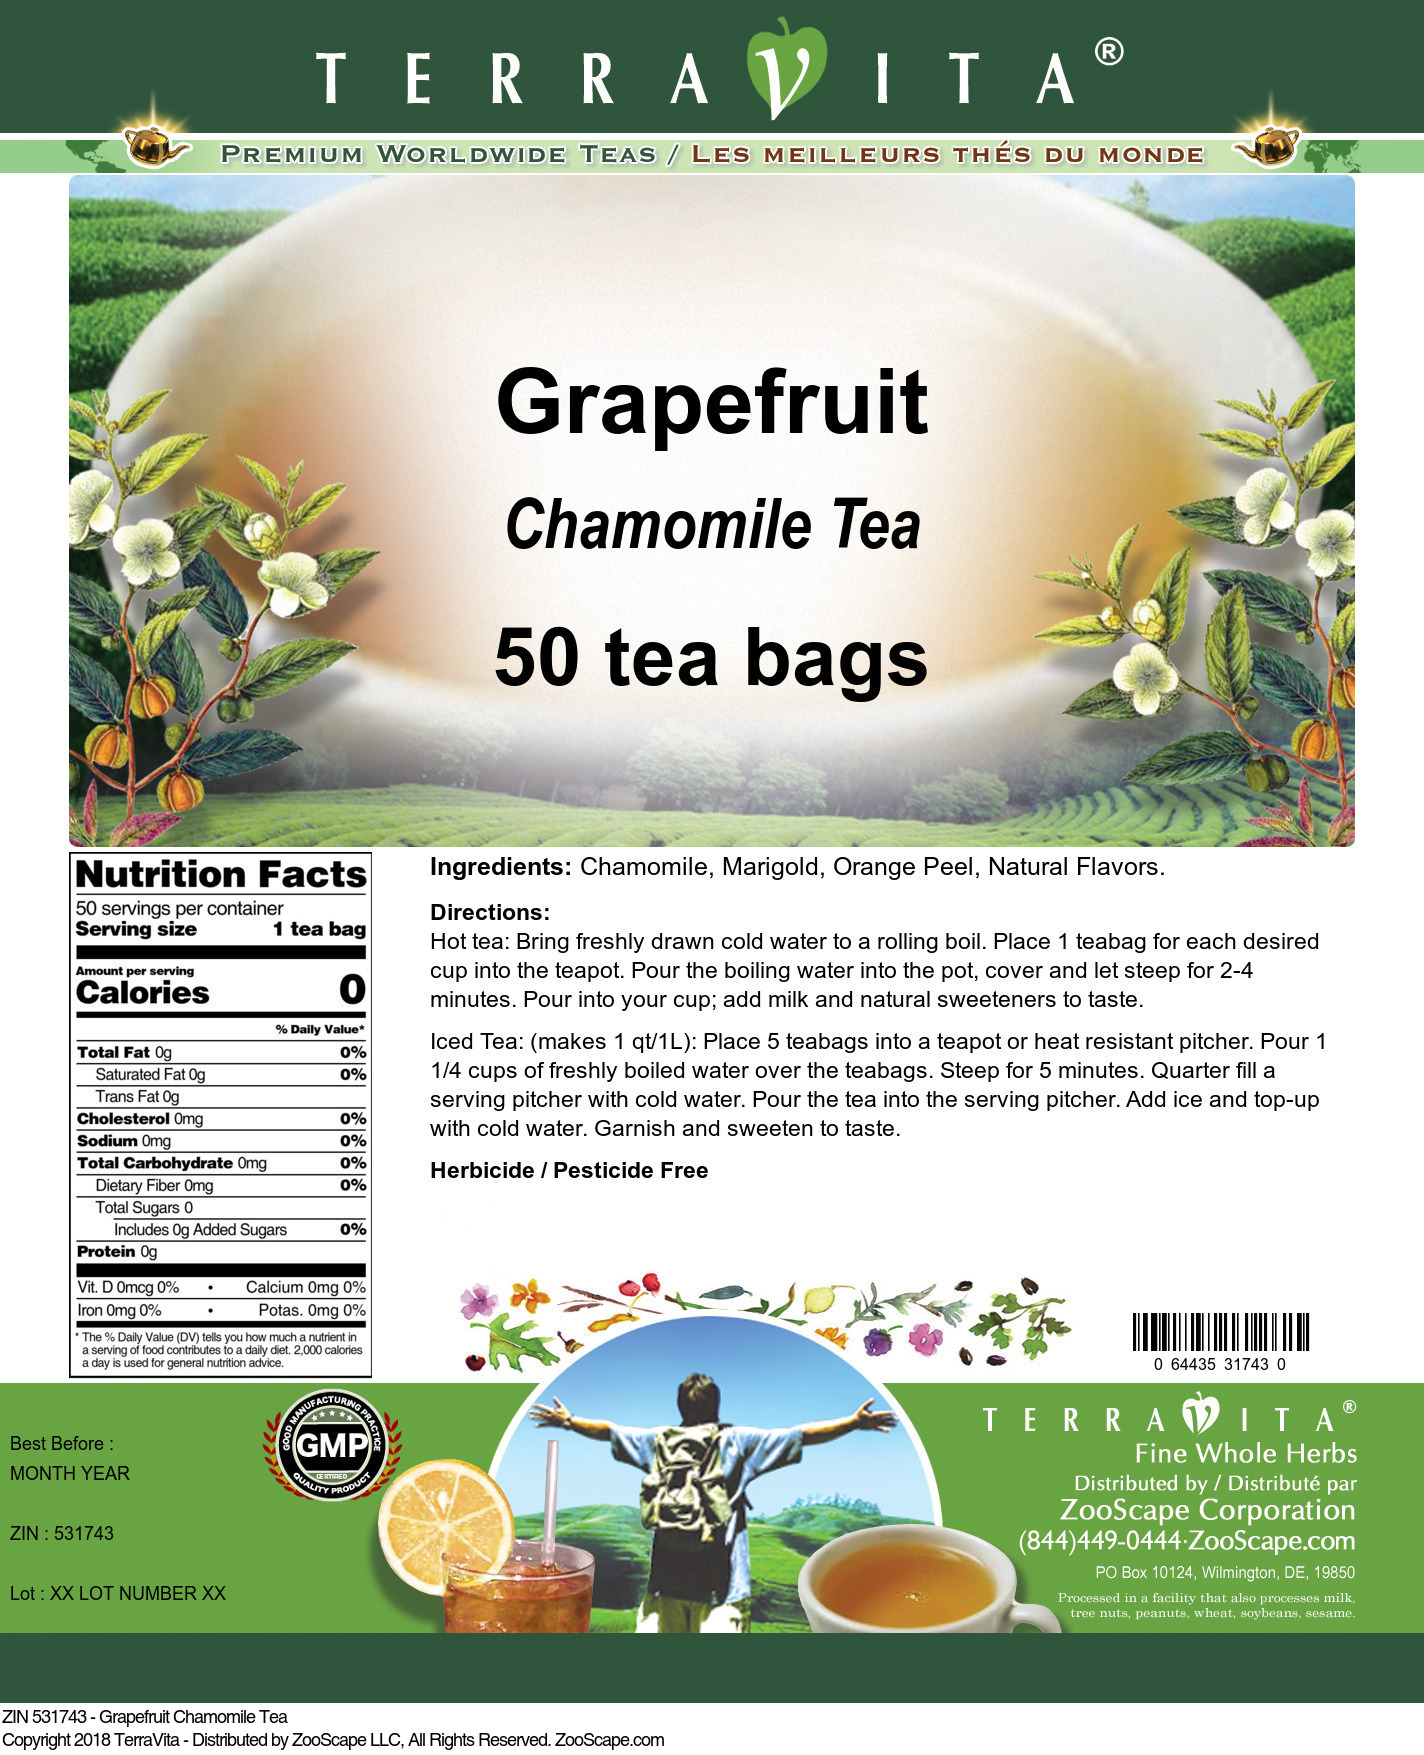 Grapefruit Chamomile Tea